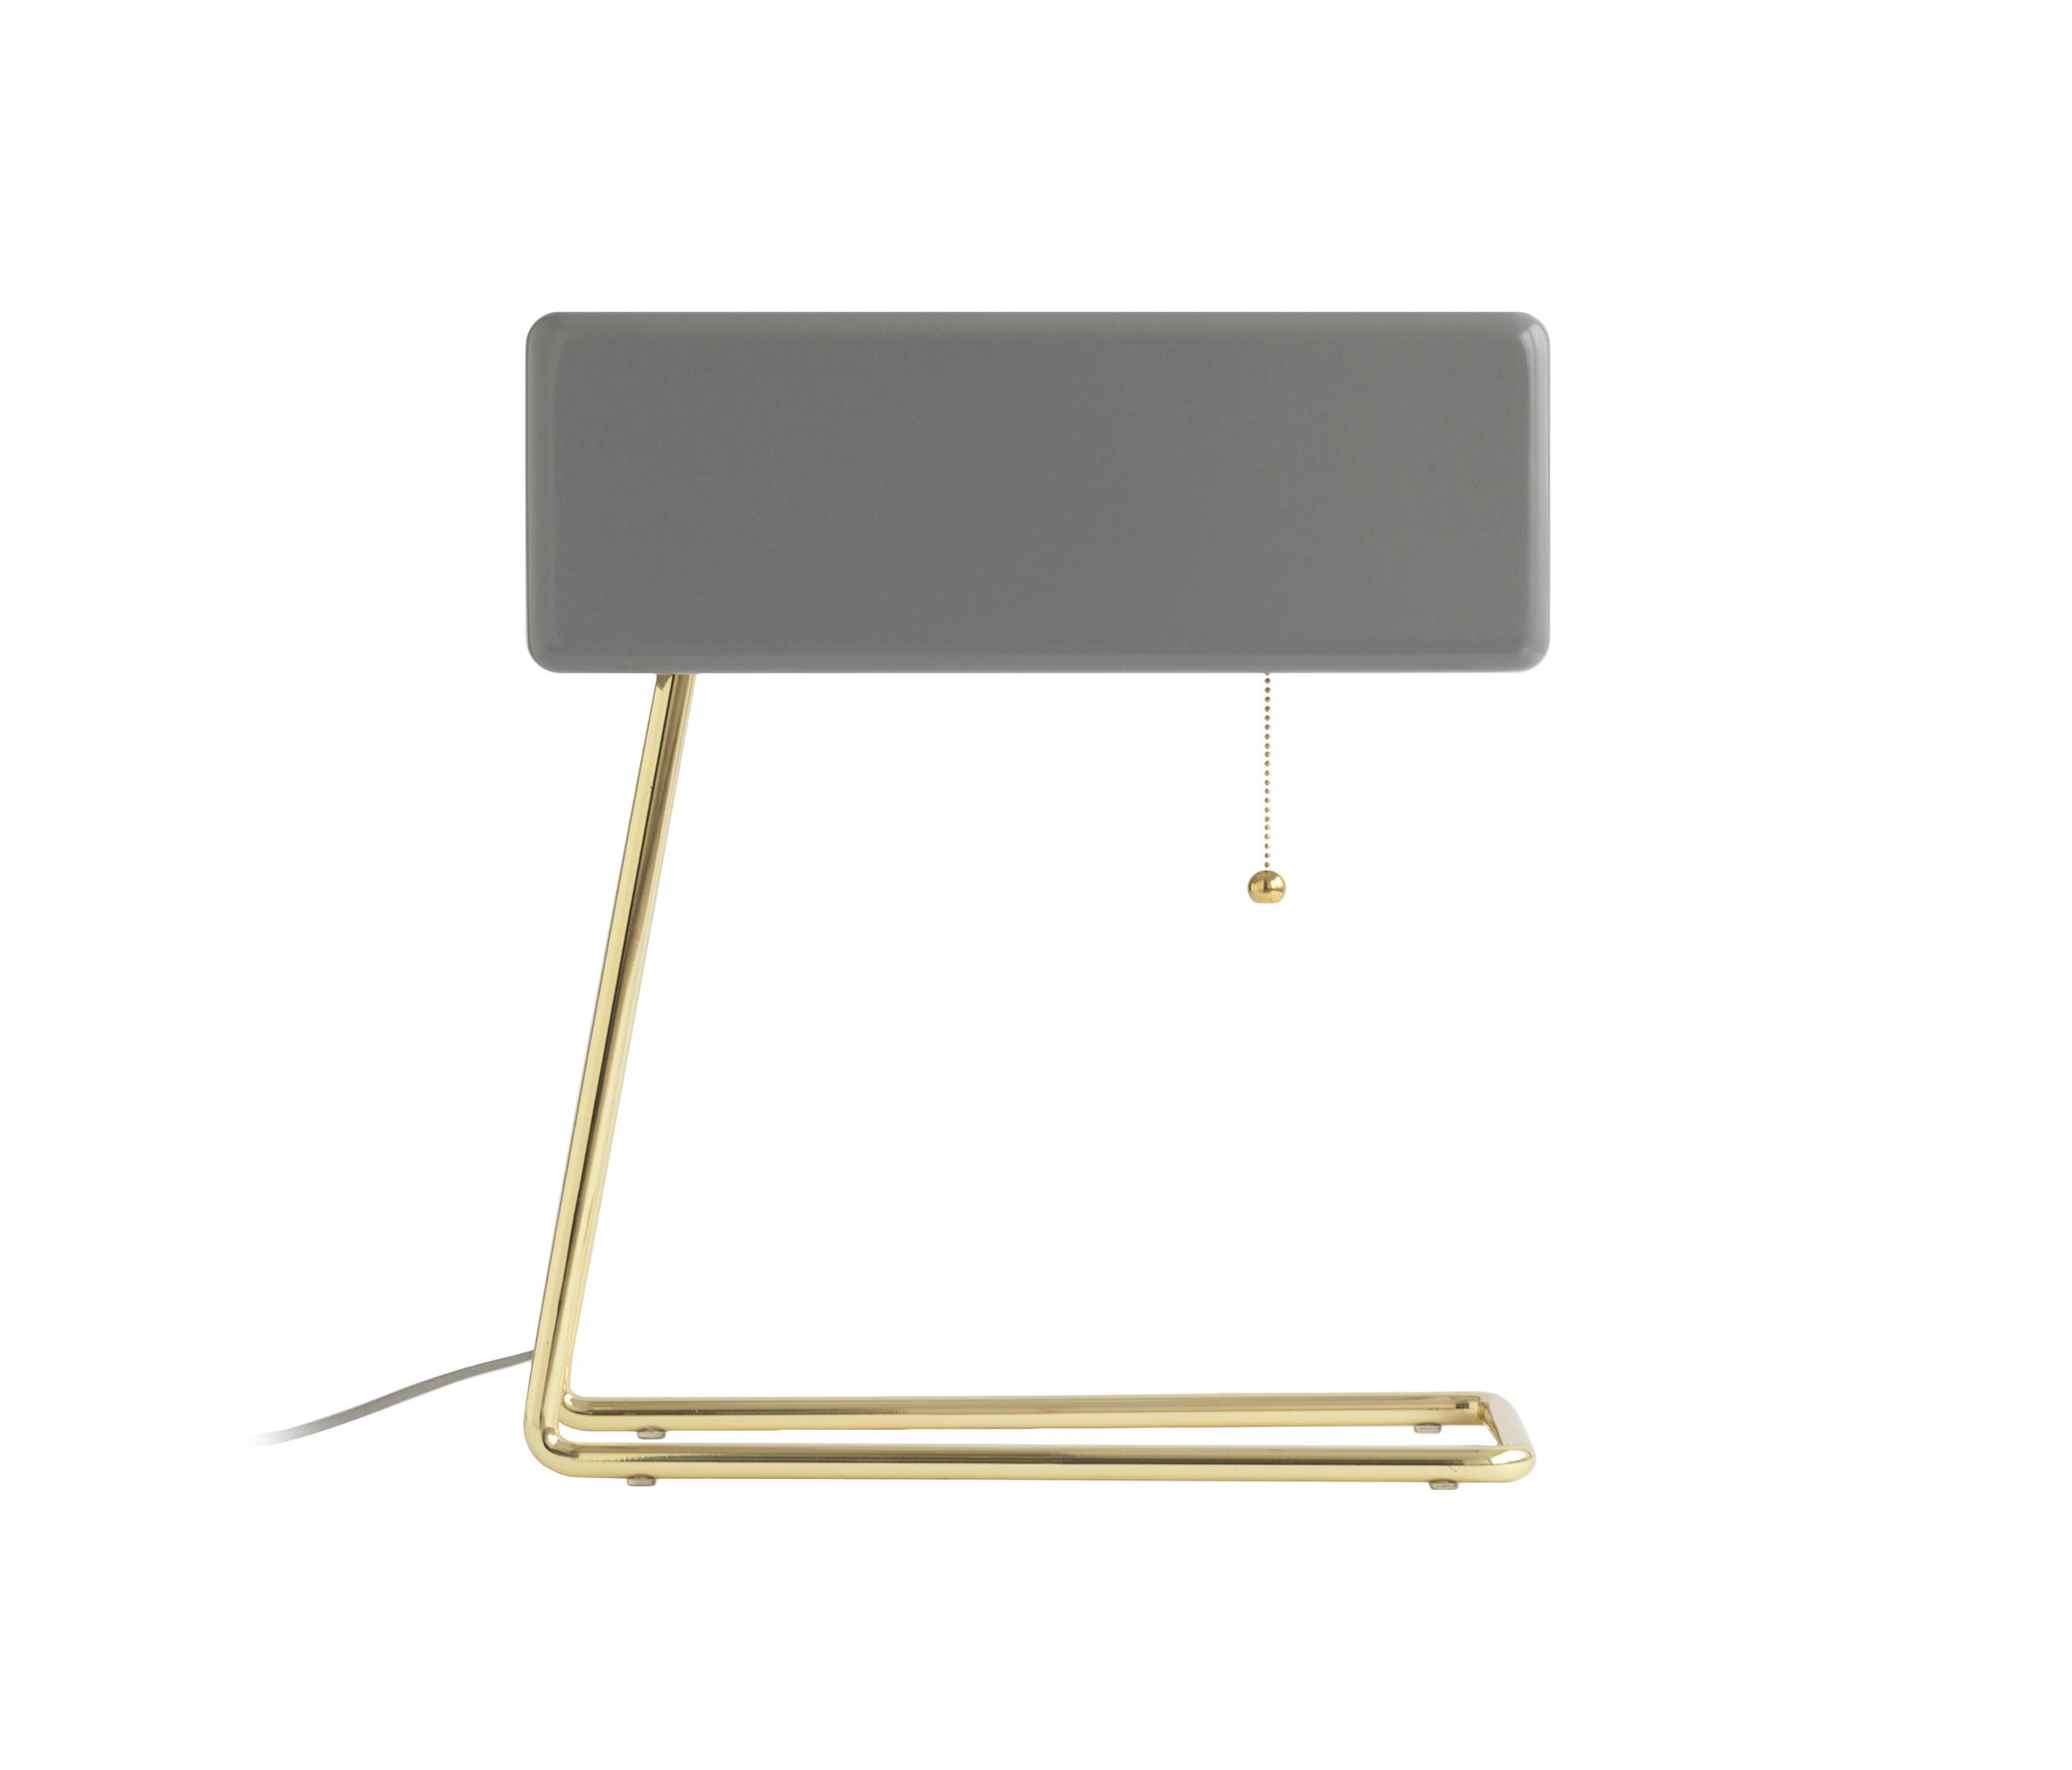 toffoli led table lamp general lighting from imamura. Black Bedroom Furniture Sets. Home Design Ideas